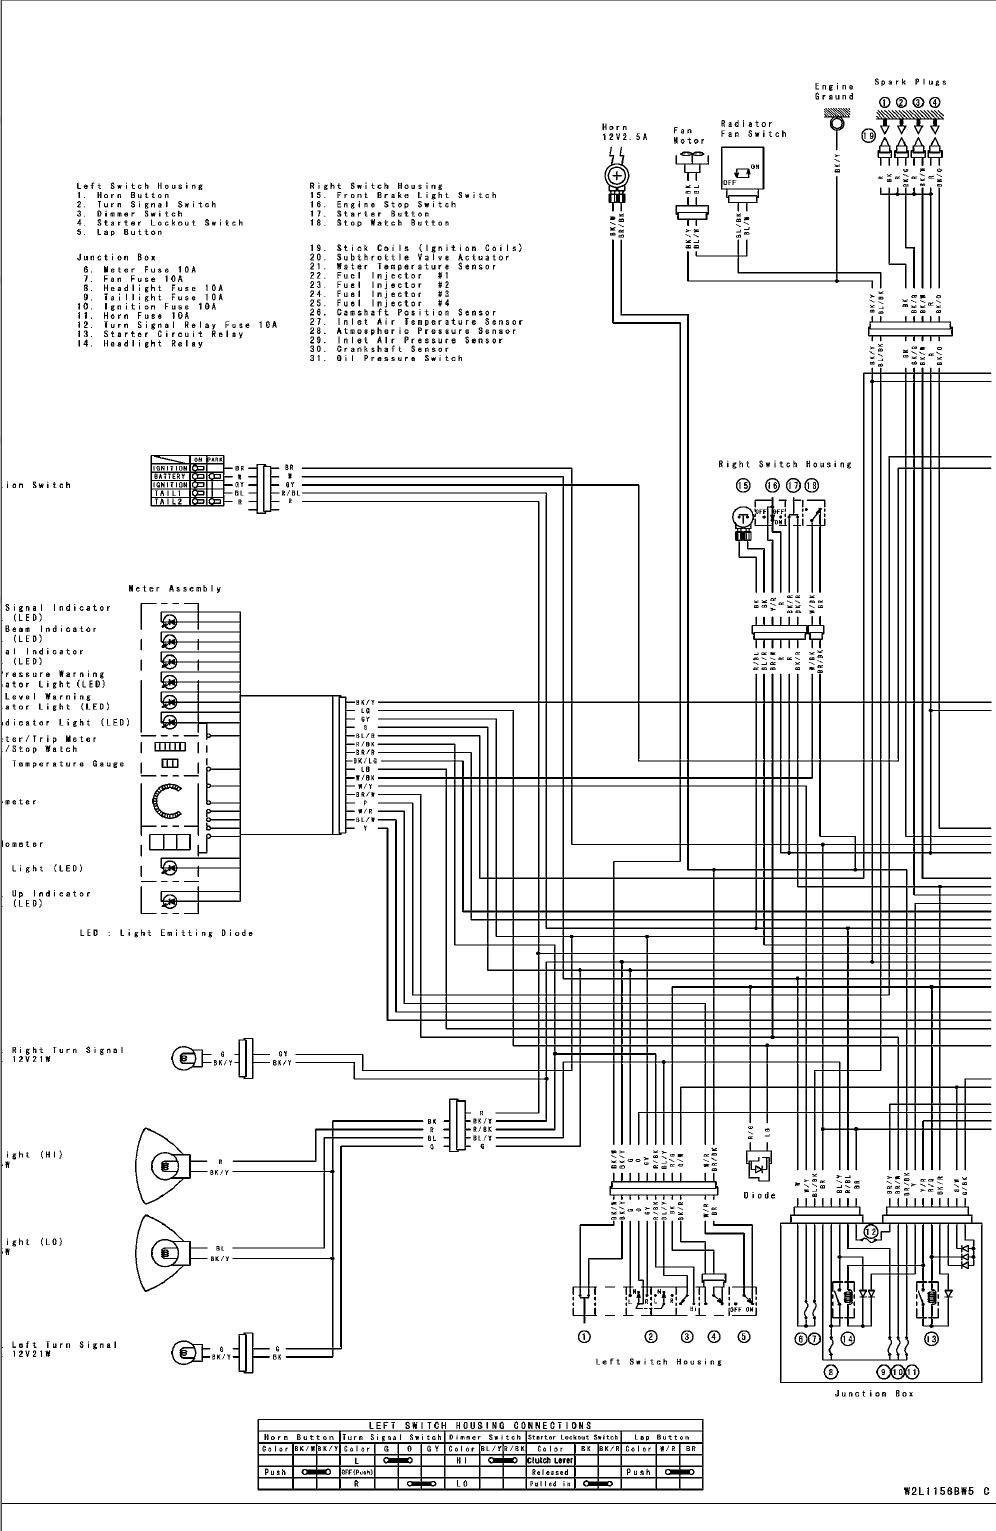 kawasaki ignition coil wiring diagram hm 3202  kawasaki mule kawasaki mule ignition wire ing diagram cant  kawasaki mule ignition wire ing diagram